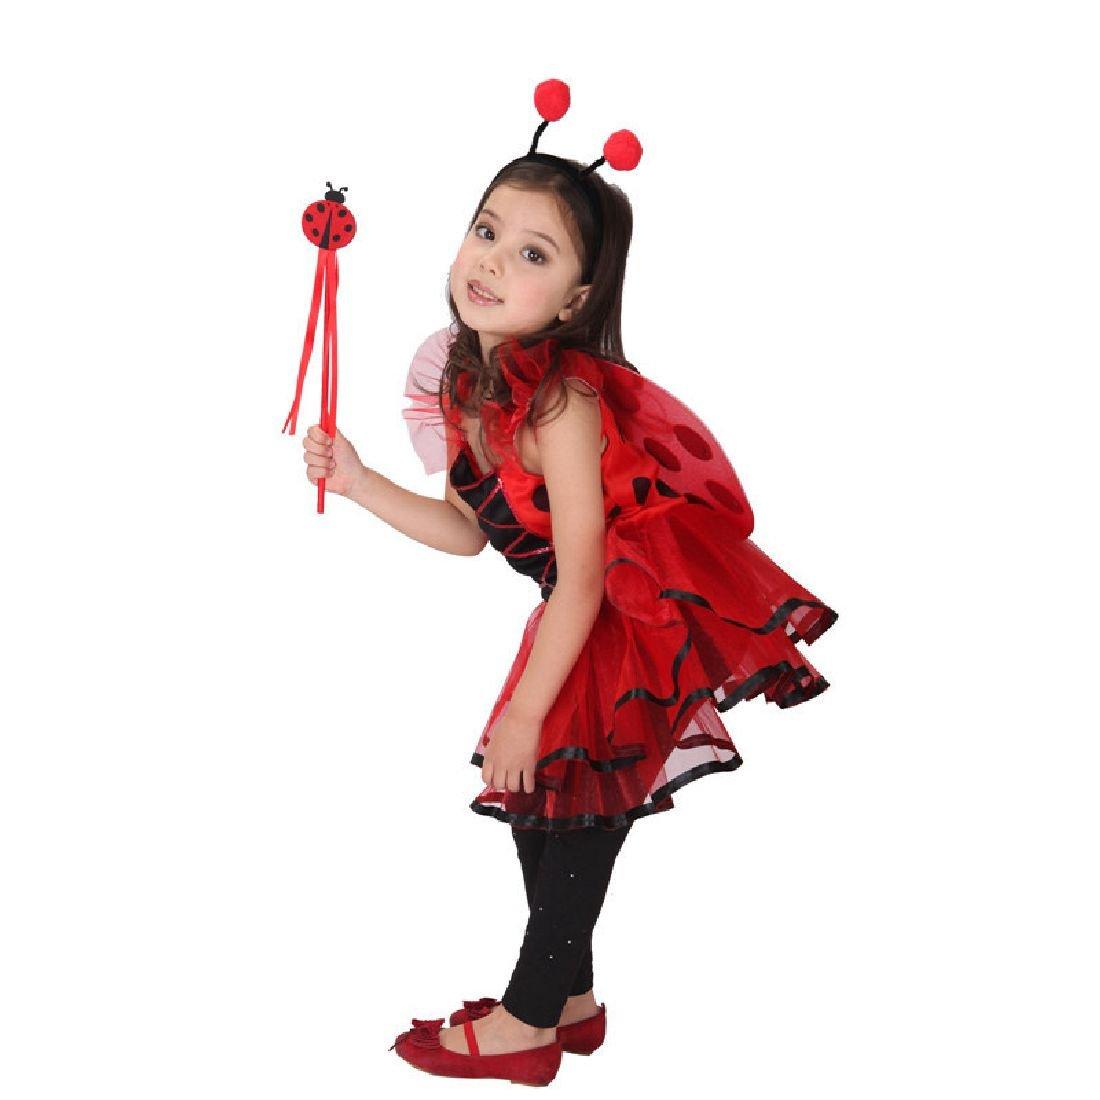 Kids Miraculous Ladybug Cosplay Costume Ladybug Romper Costume Cat Suit by Crystalbella Inflatable Cos